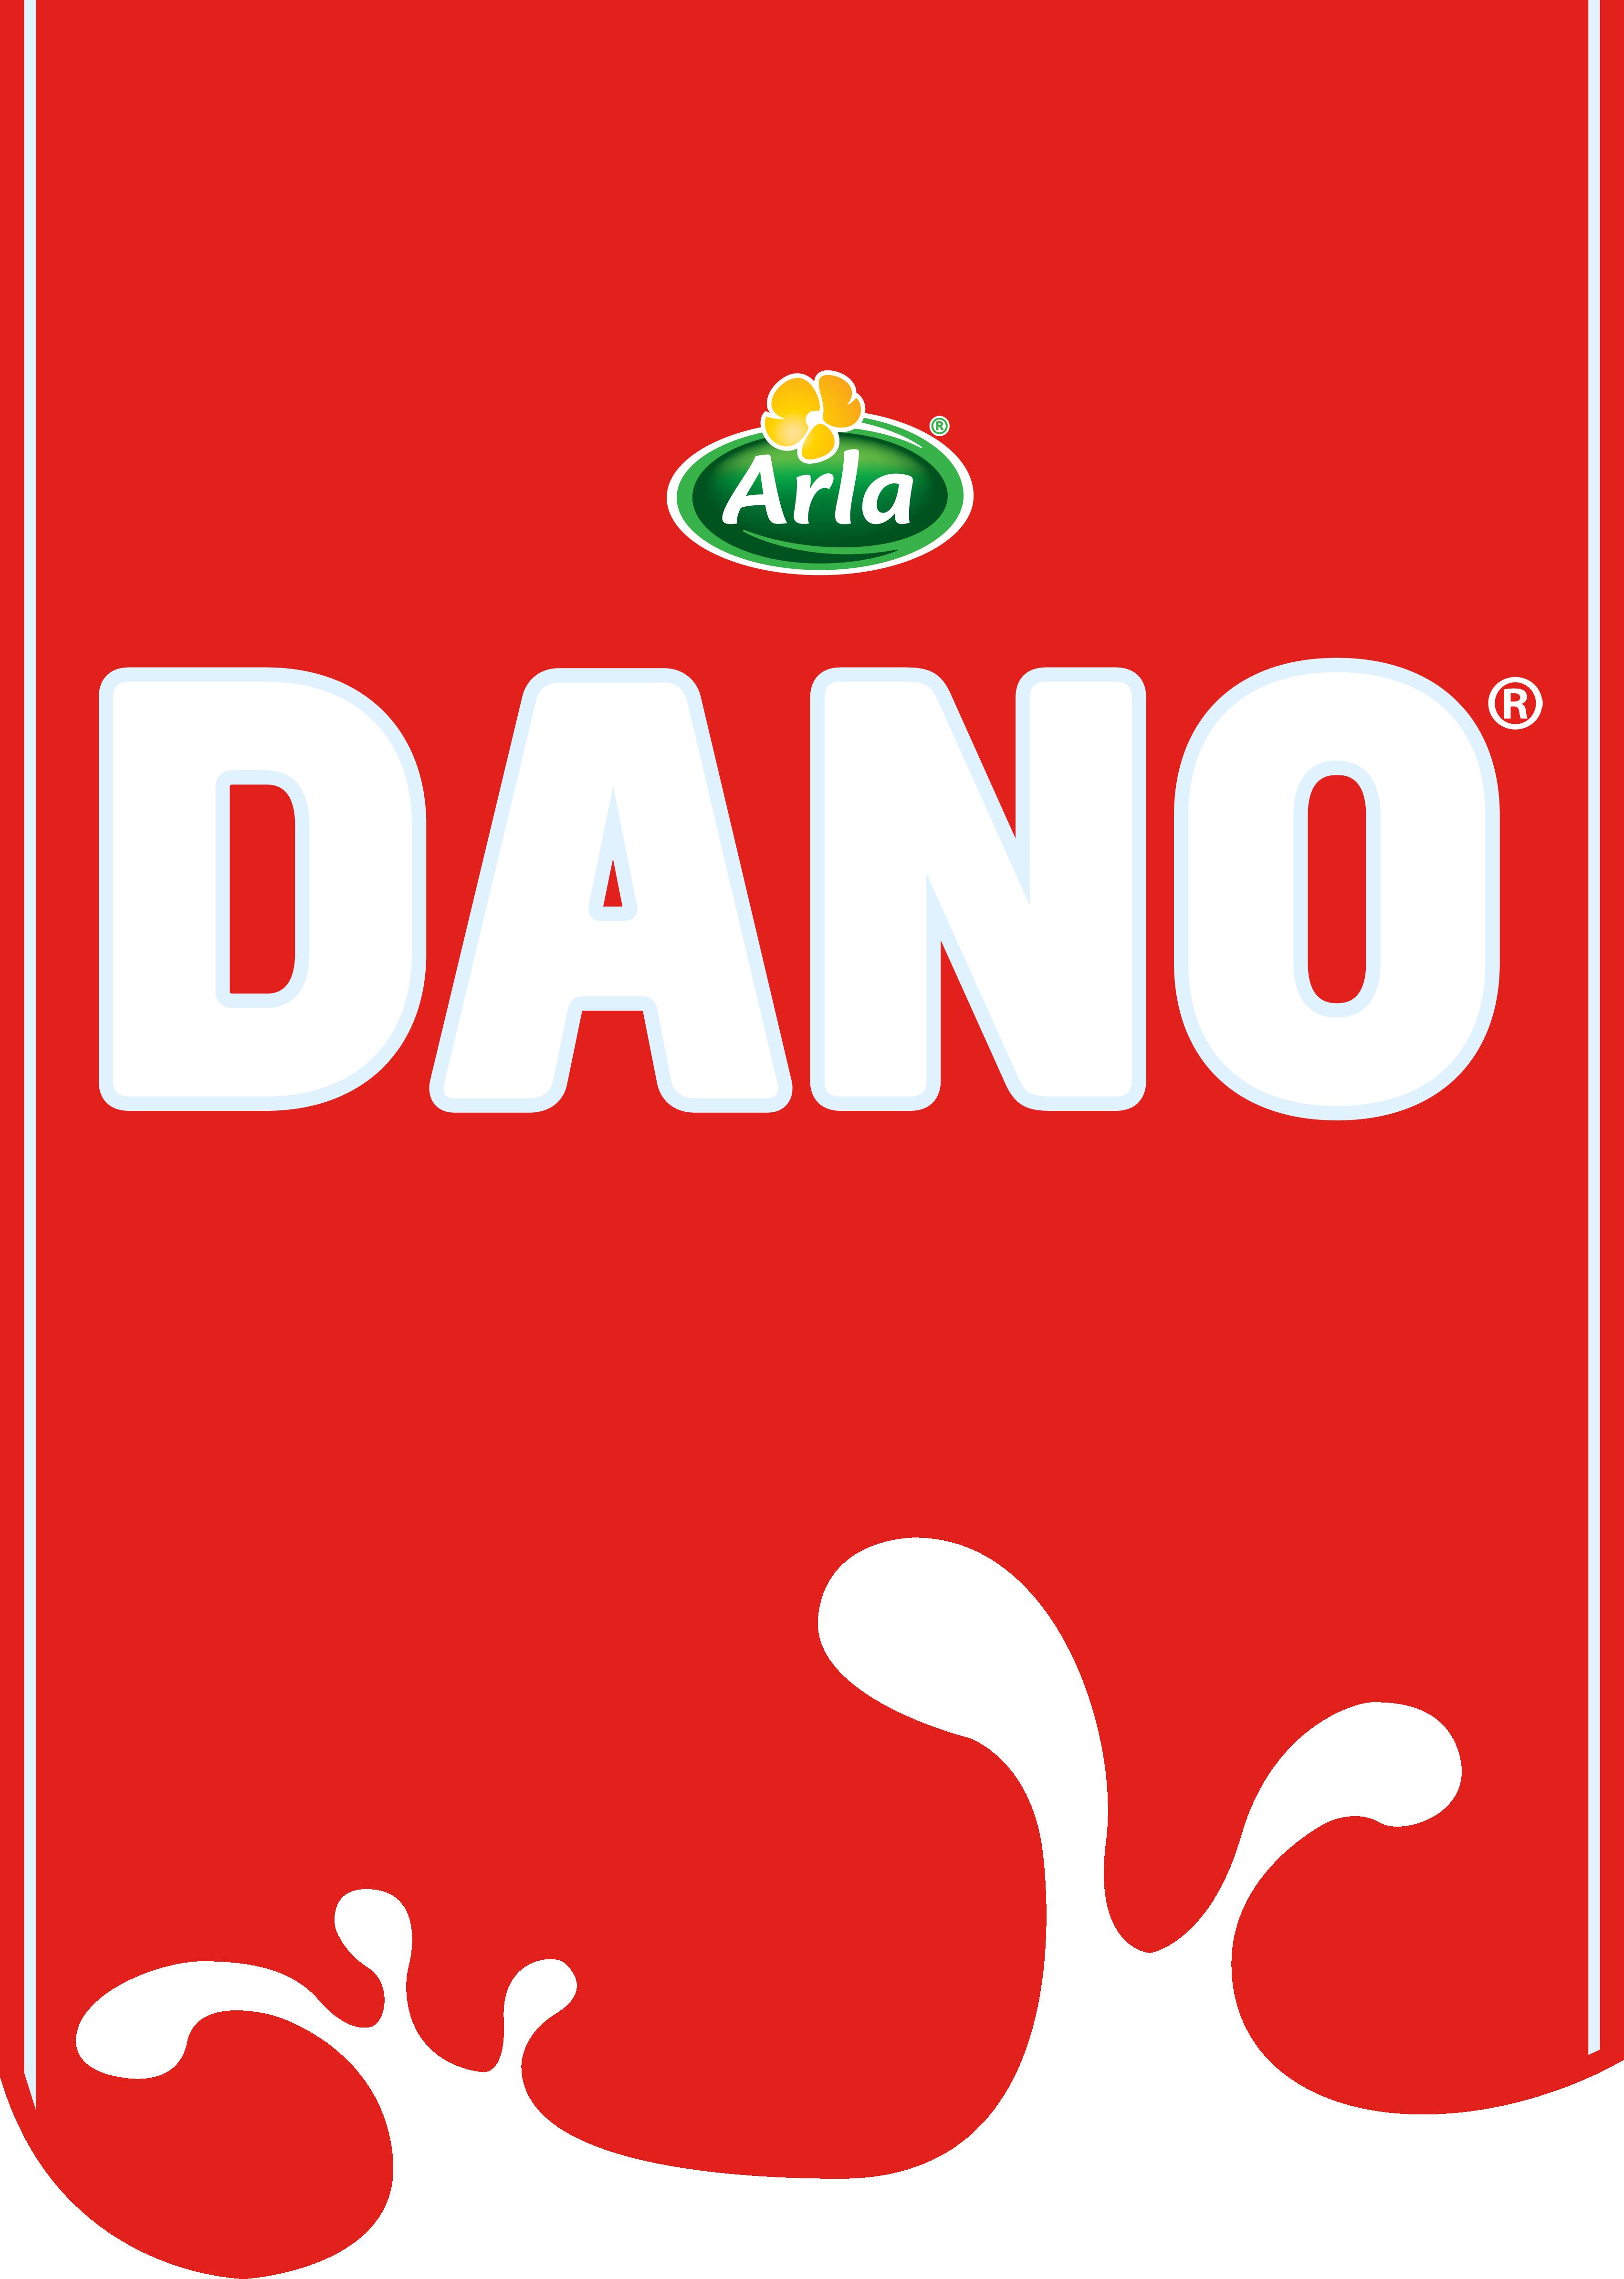 https://assets.roar.media/assets/lBhOlLndXTAtO8Qw_Dano-Logo-FInal.png